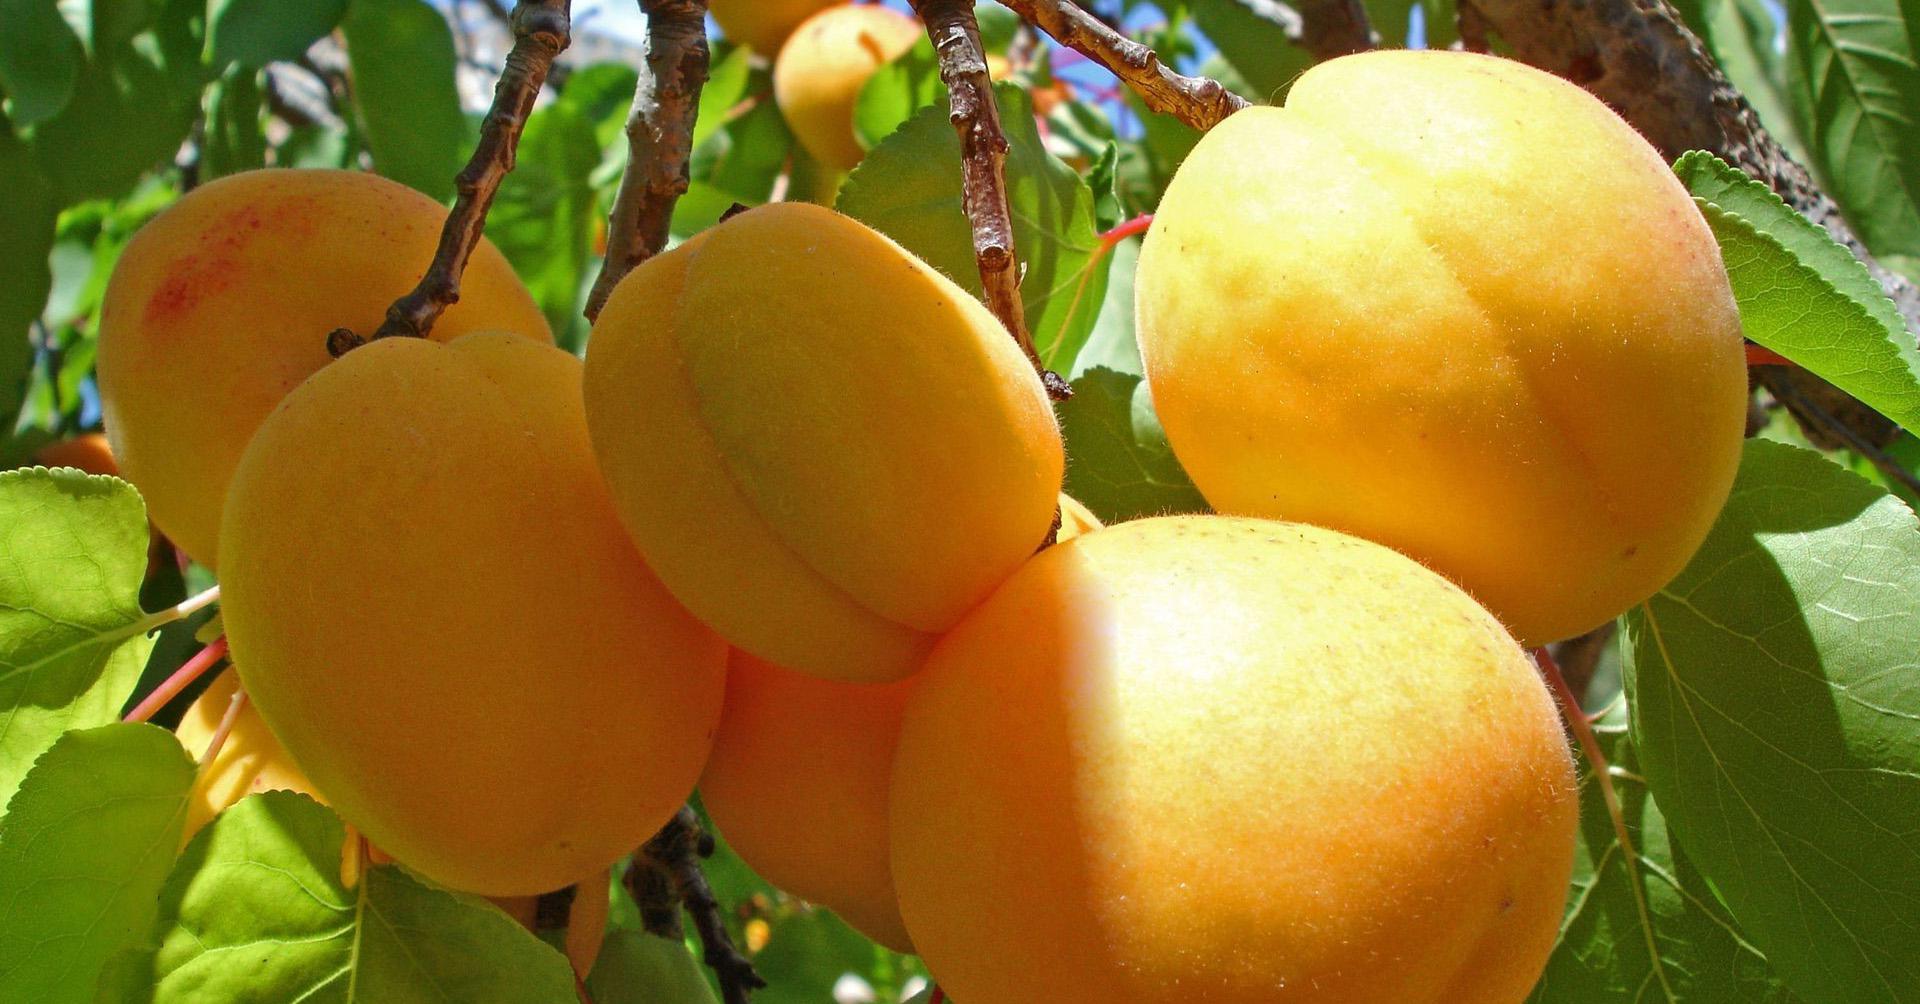 Wallpaper Orange Peach Bokeh Persimmon Citrus Mango Produce Apricot Diospyros Fruit Tree 1920x1004 Px Loquat Prunus Local Food Ebony Trees